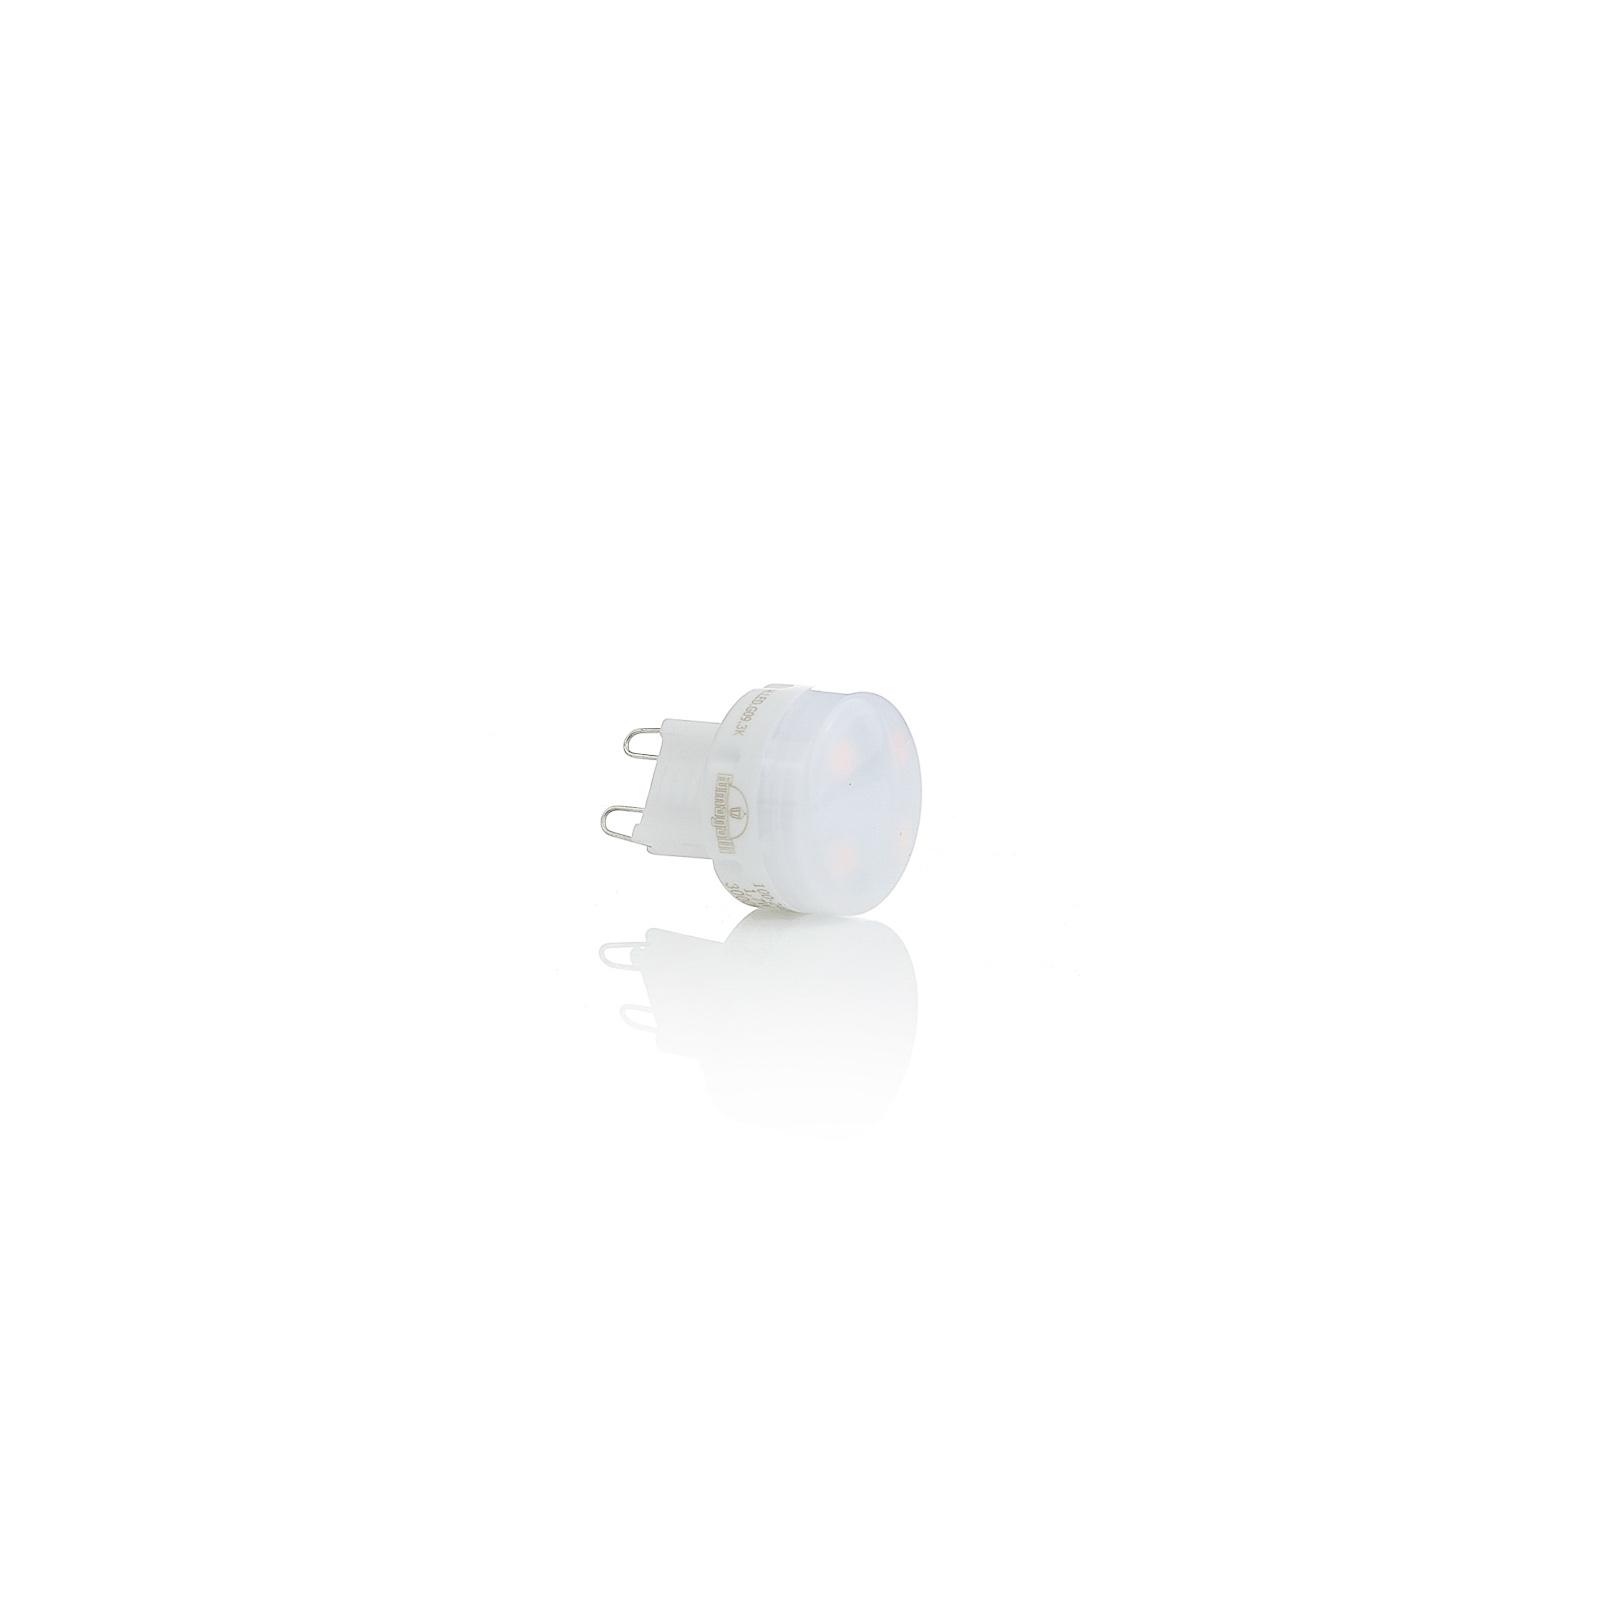 Żarówka LED G9, 1,7 W, 170 lm, 3000K